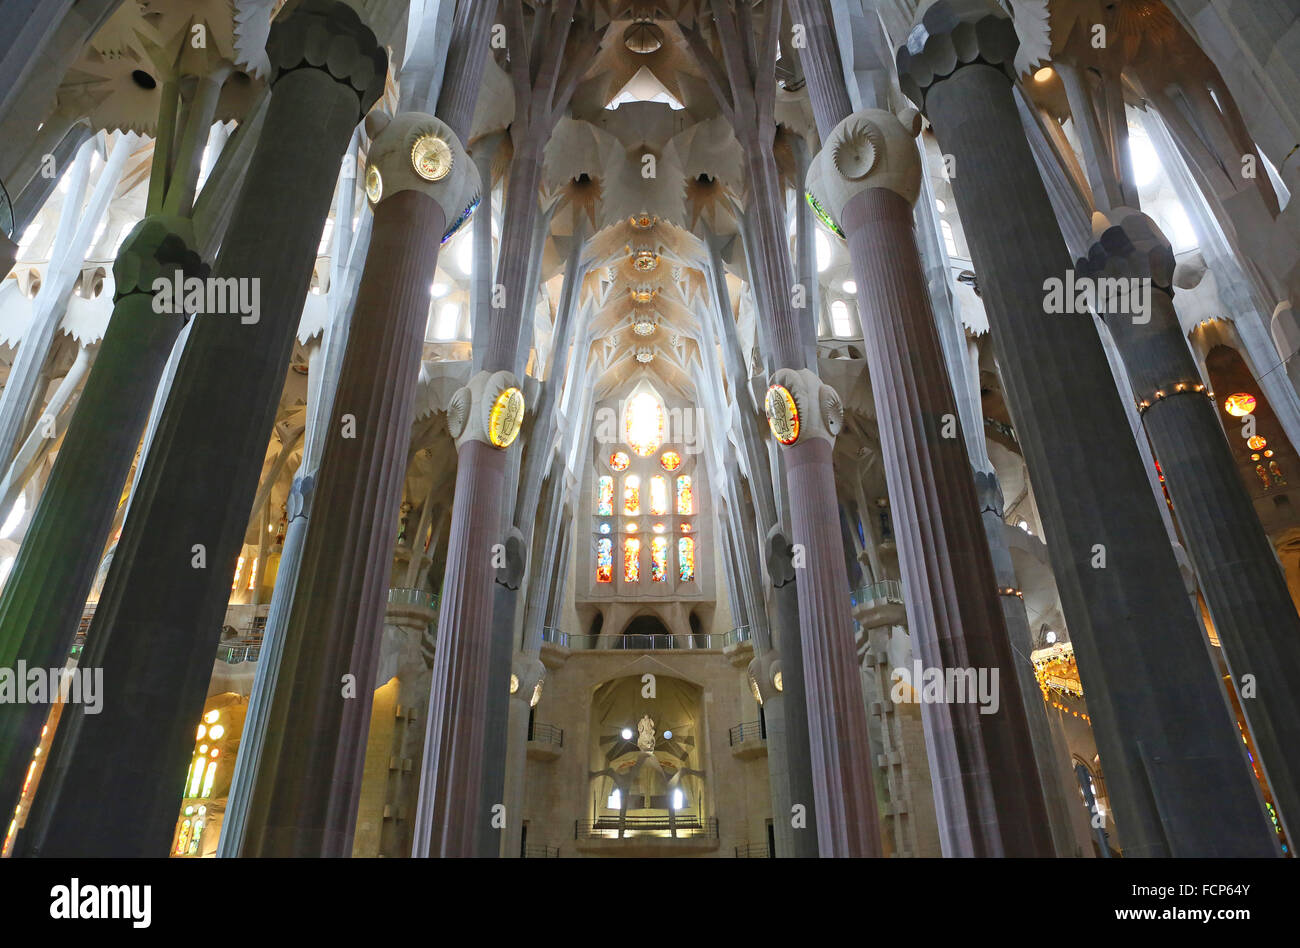 Ceiling of Basilica Sagrada Familia, Barcelona, Spain. - Stock Image